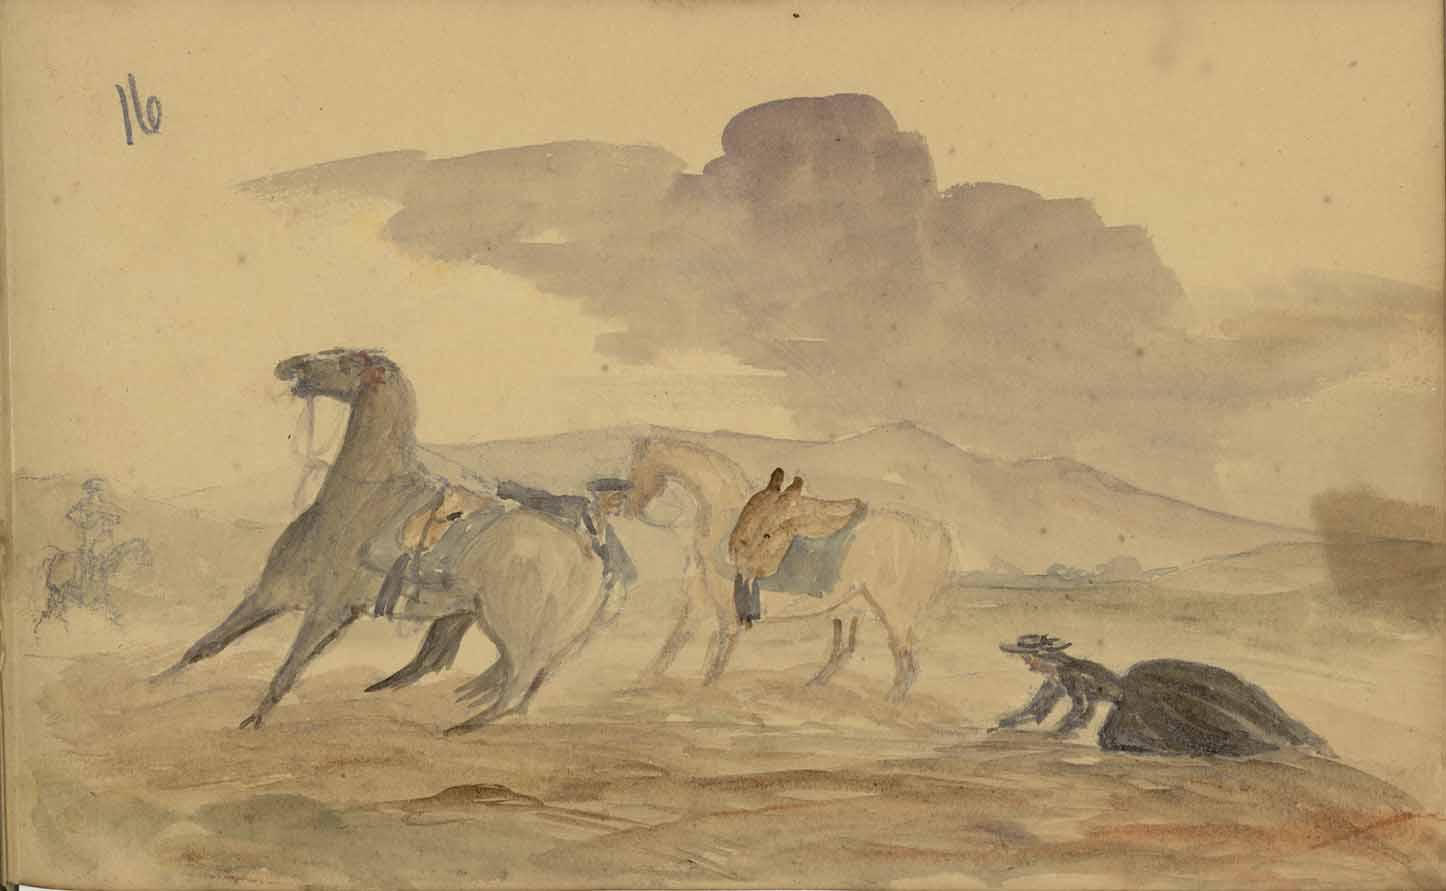 19th century woman's scrapbook watercolor